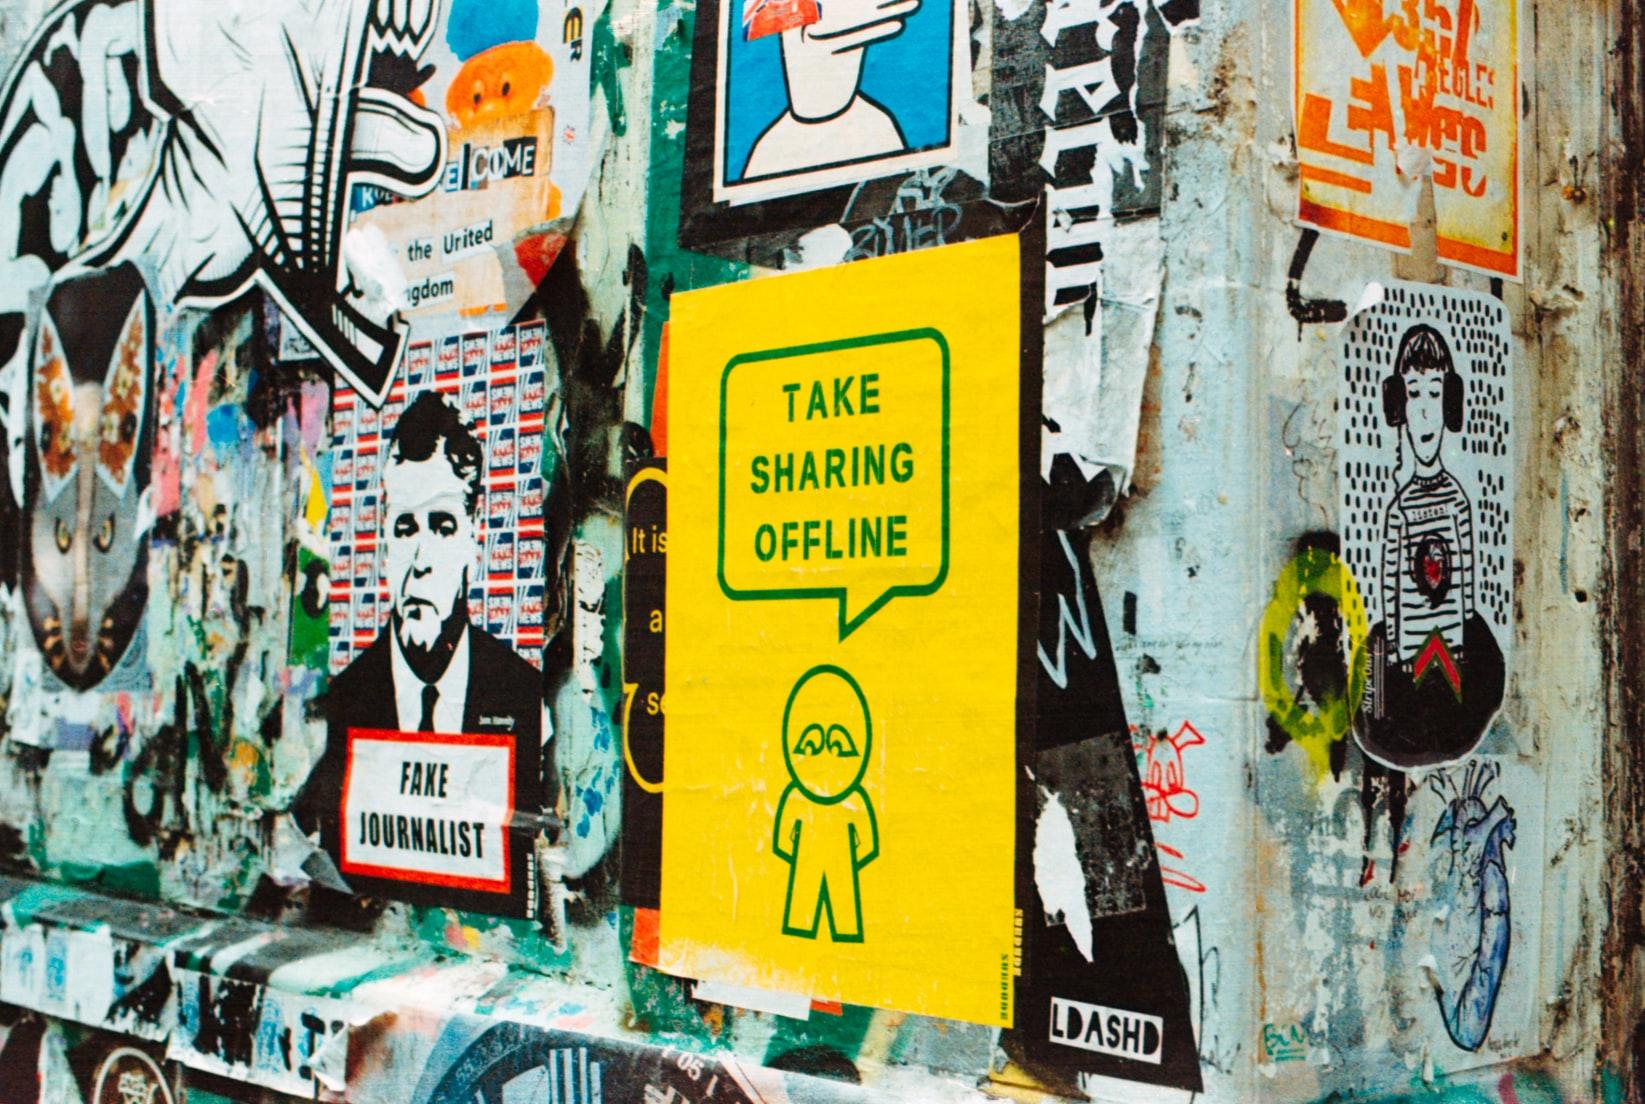 Share Online Offline